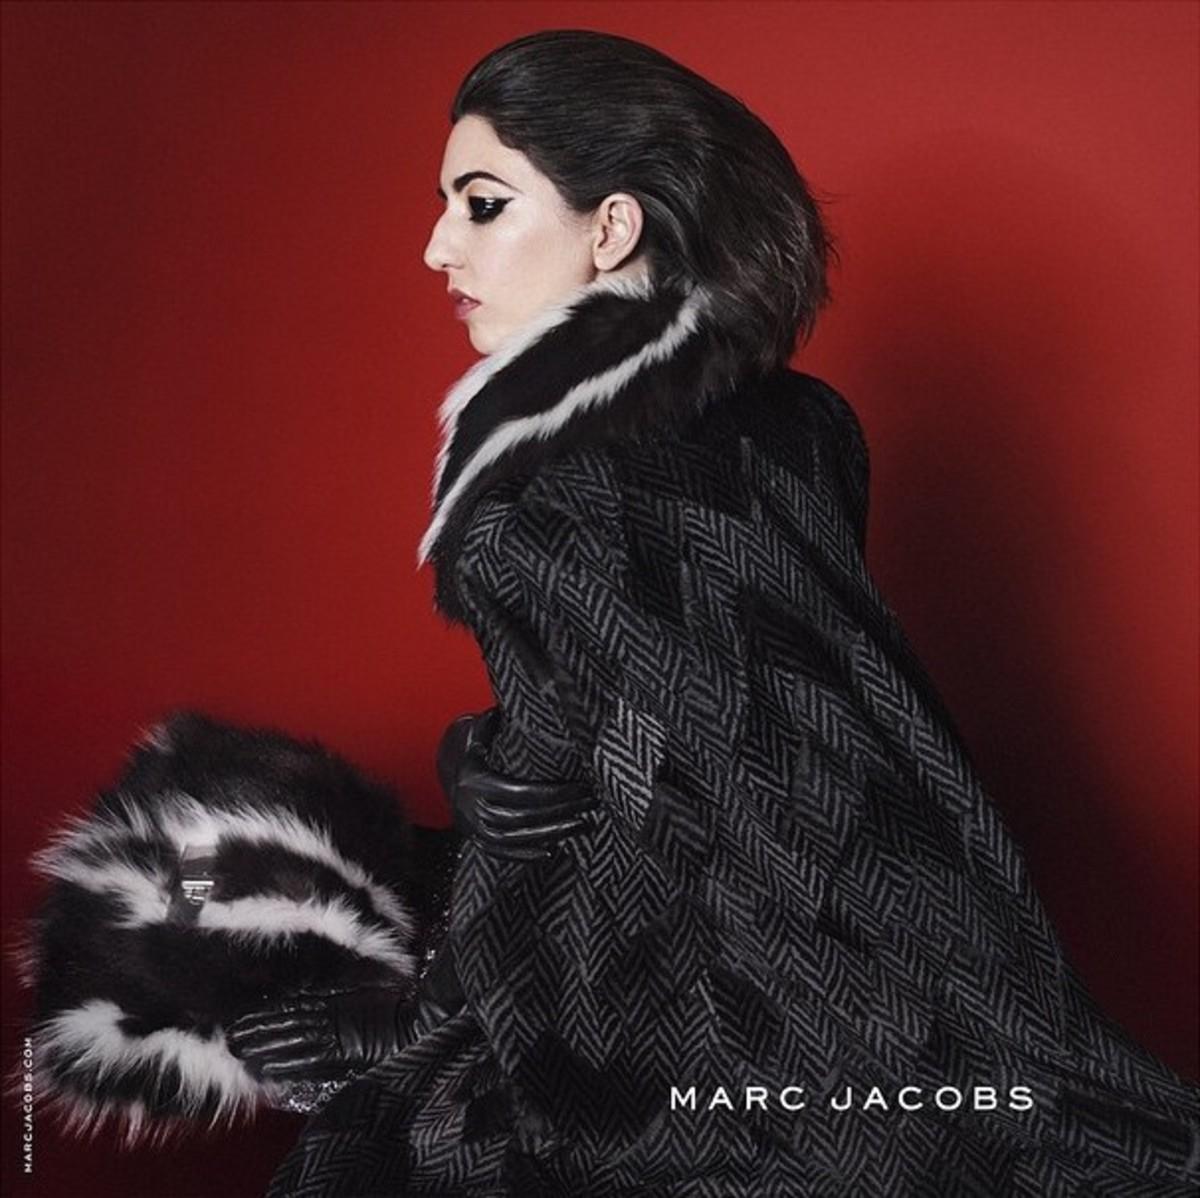 Sofia Coppola for Marc Jacobs, Fall 2015. Photo: David Sims